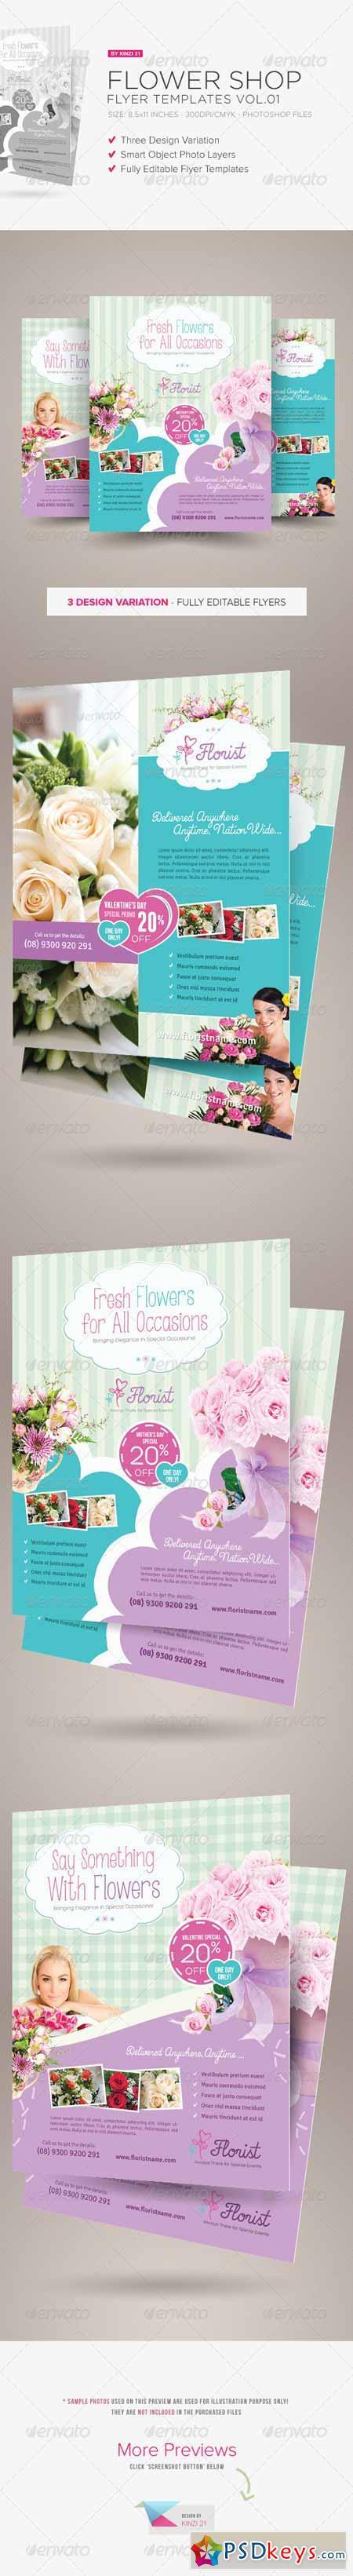 Flower Shop Flyer Templates 6566352